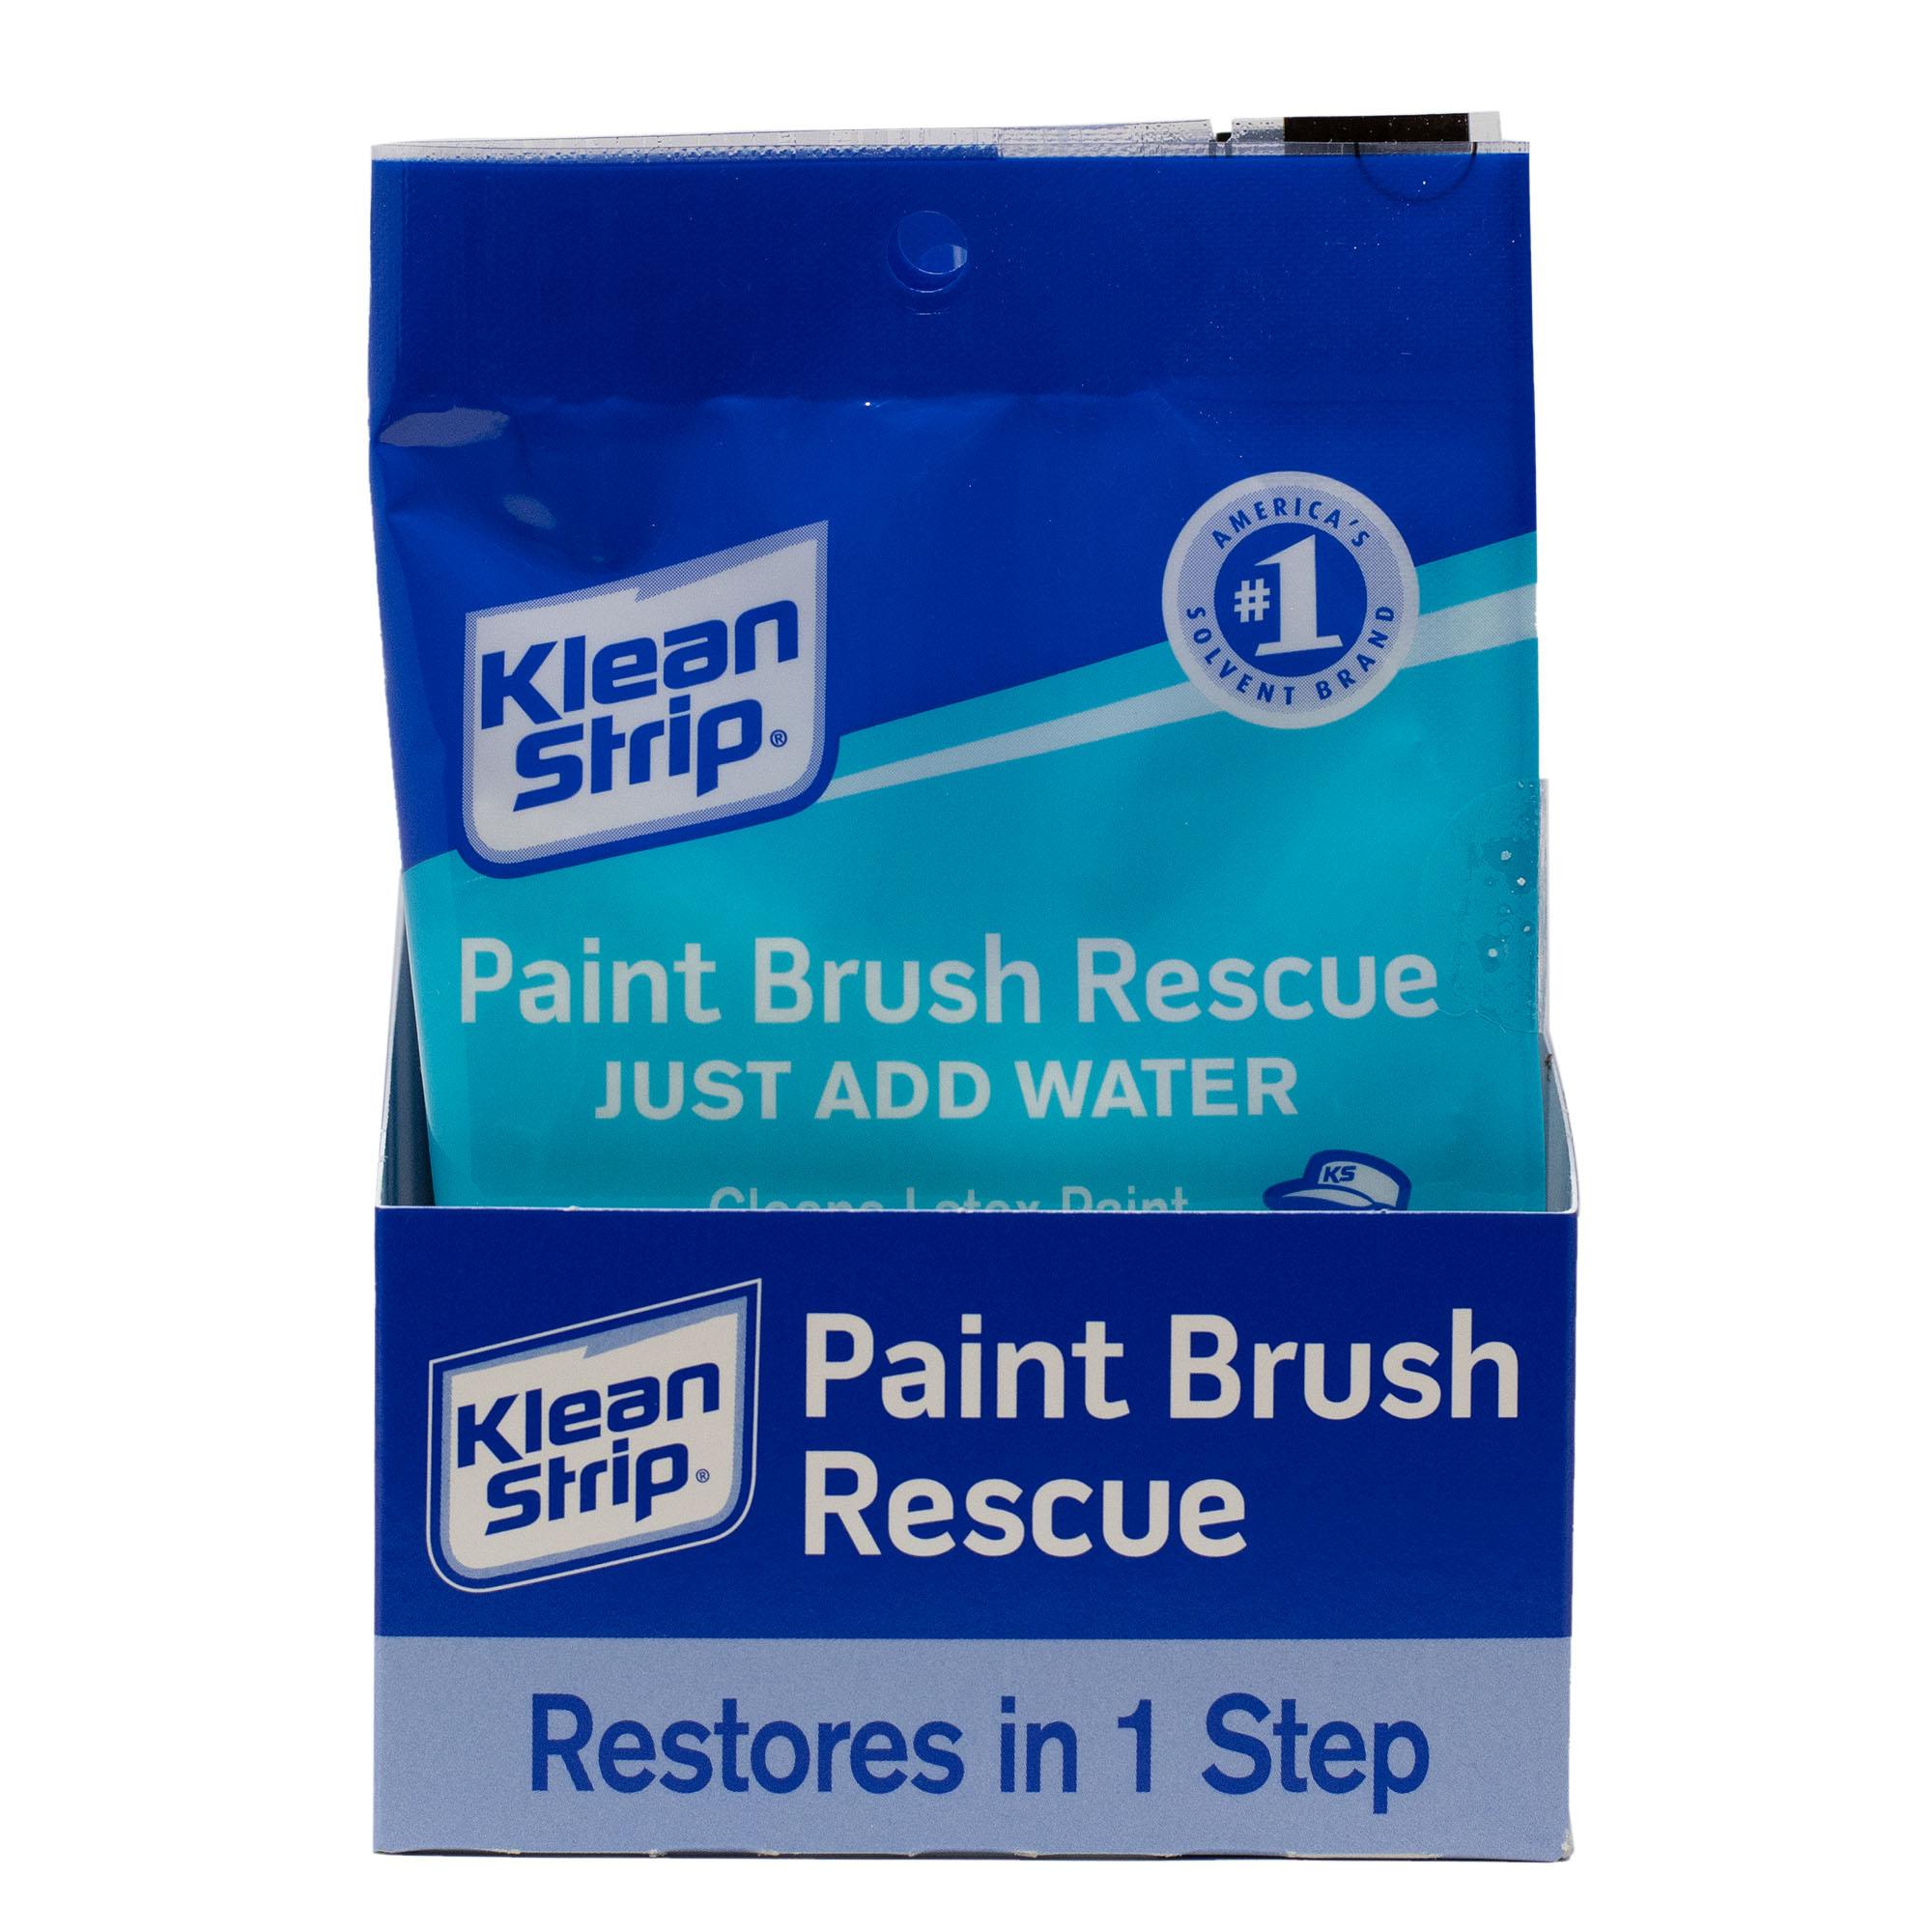 Paint Brush Rescue